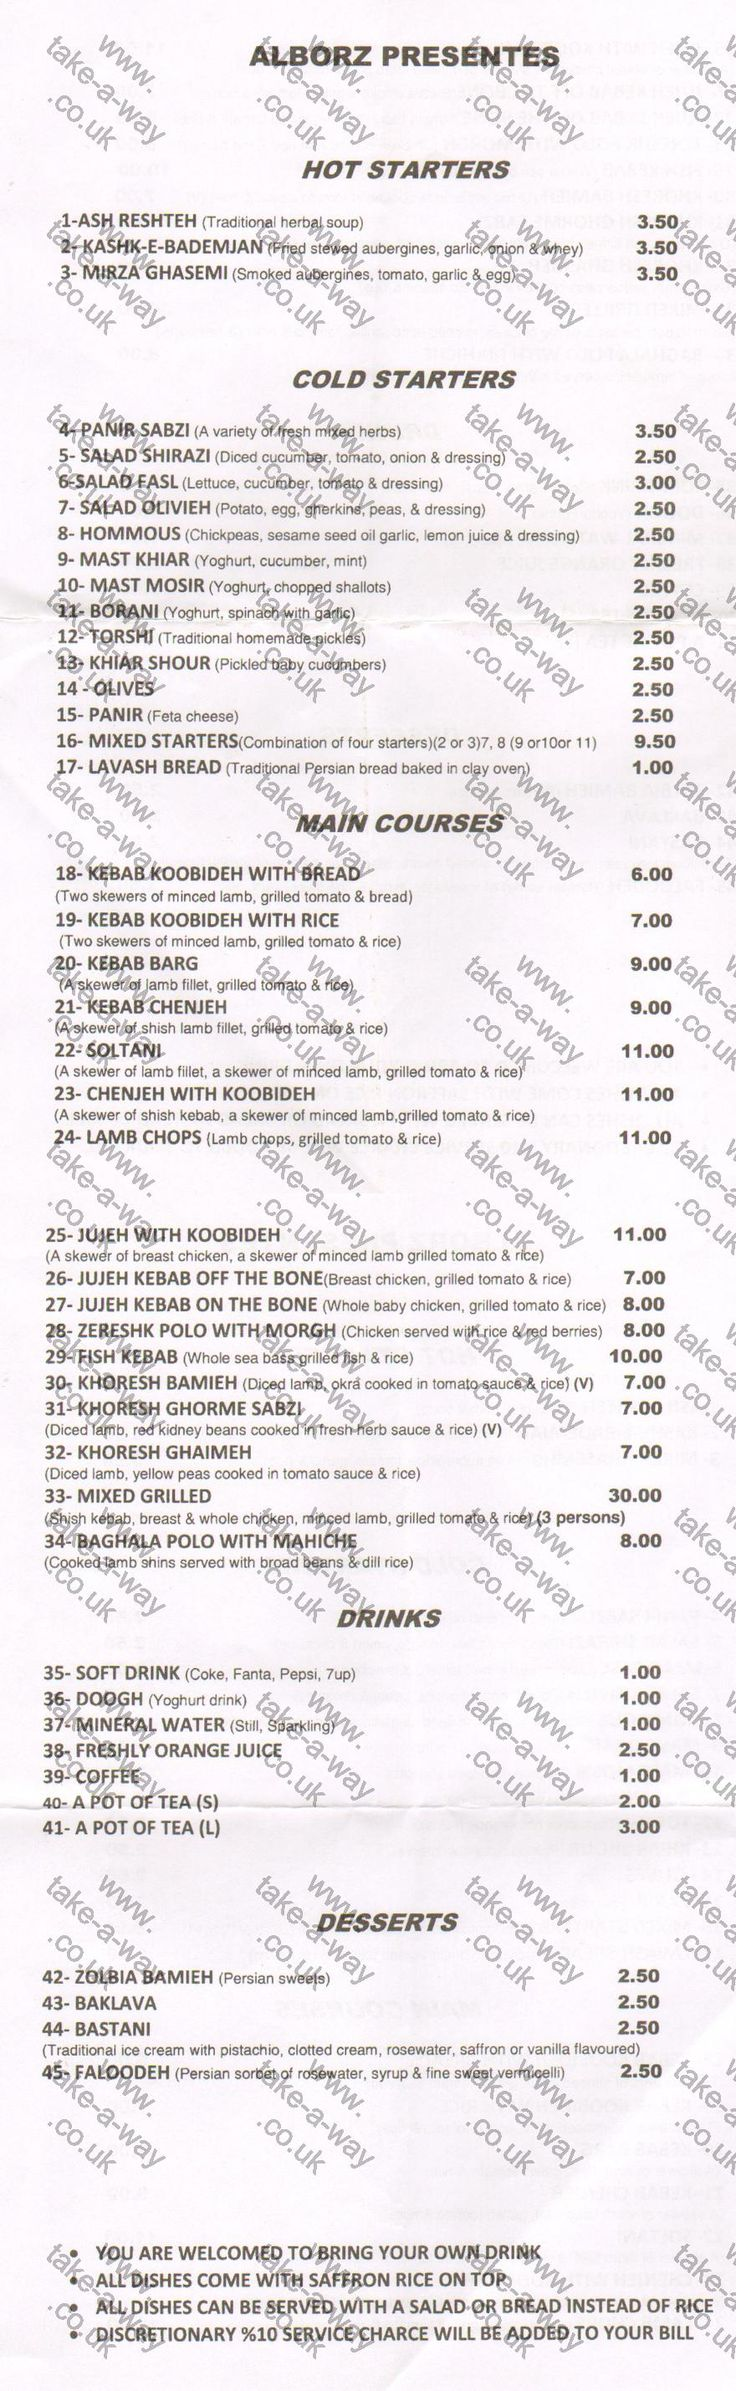 Alborz Restaurant - Kensington take away menu